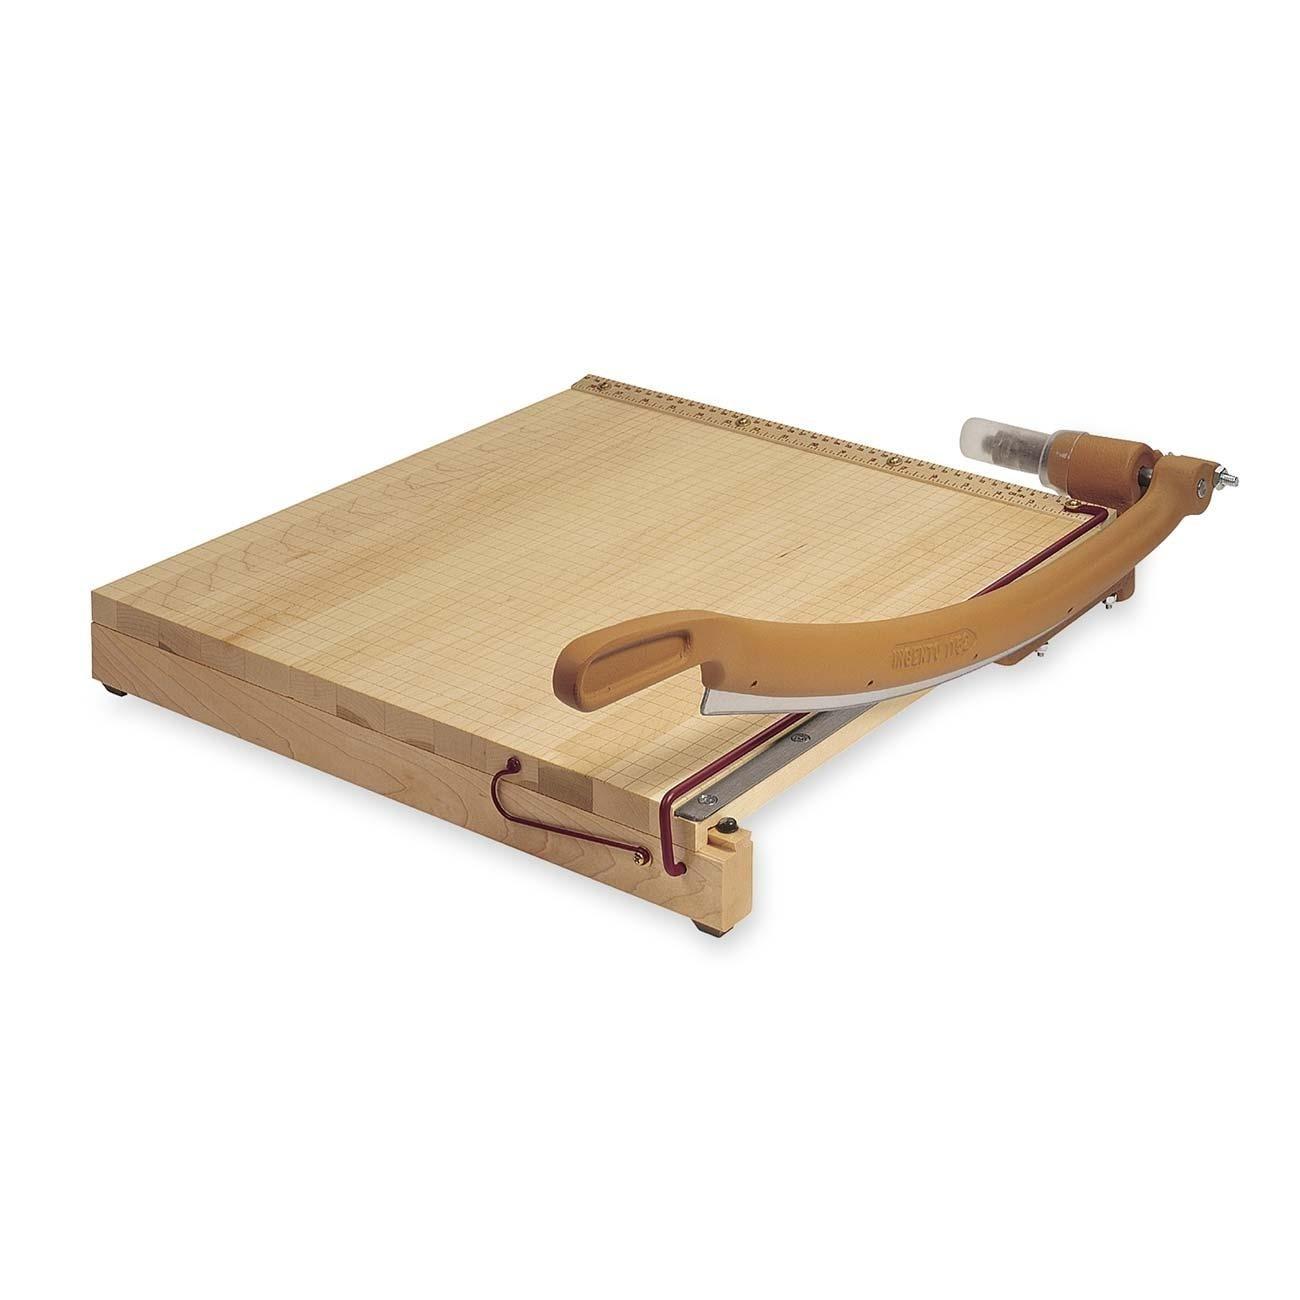 Swingline Paper Trimmer / Cutter, Guillotine, 24'' Cut Length, 15 Sheet Capacity, ClassicCut Ingento (1162)